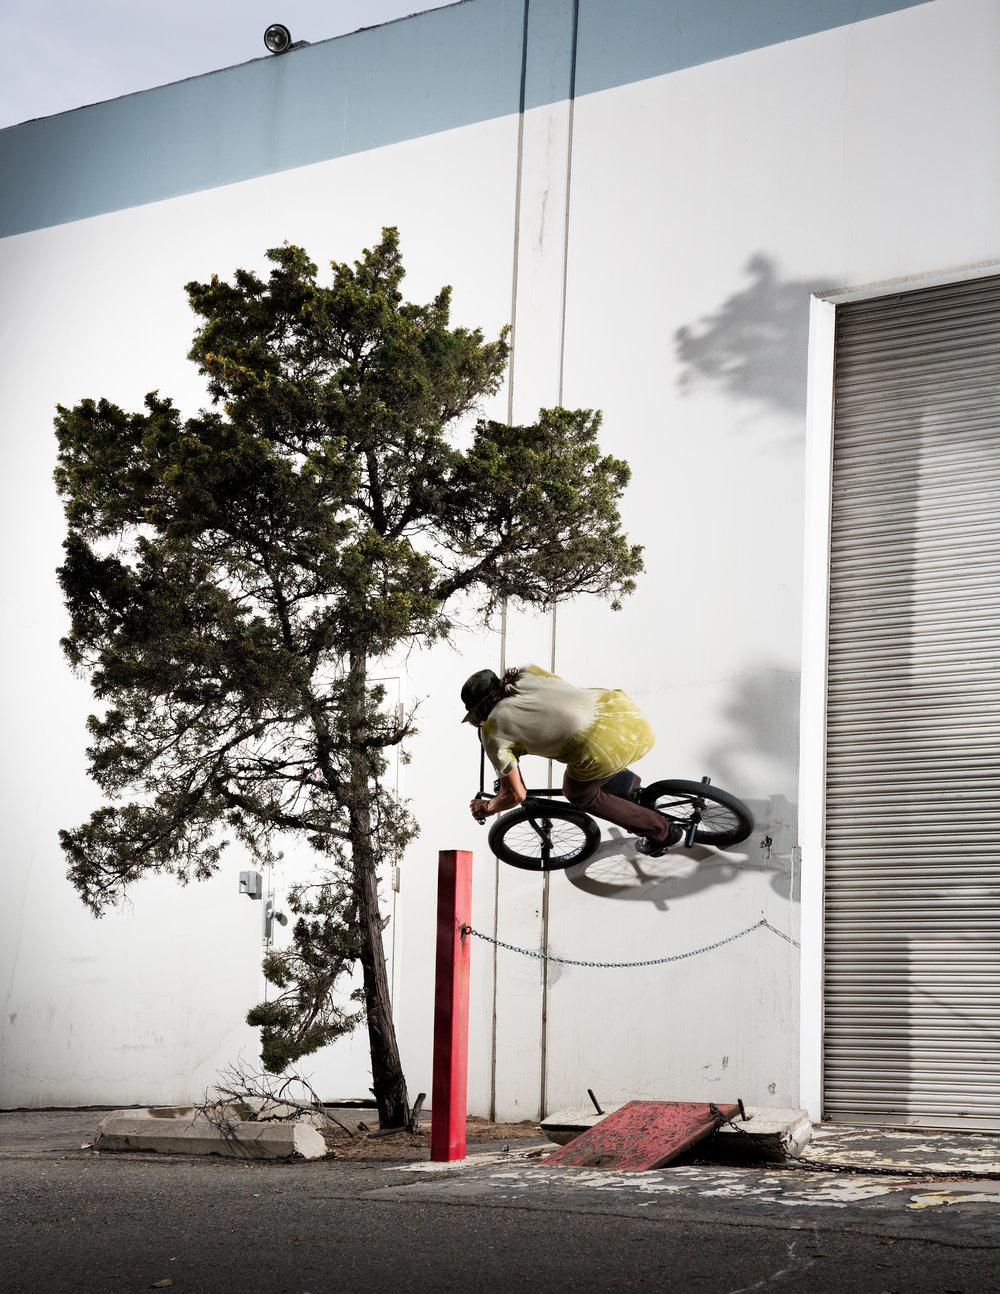 Mike-Mastroni-BMX-Wallride-Devin-Feil.jpg